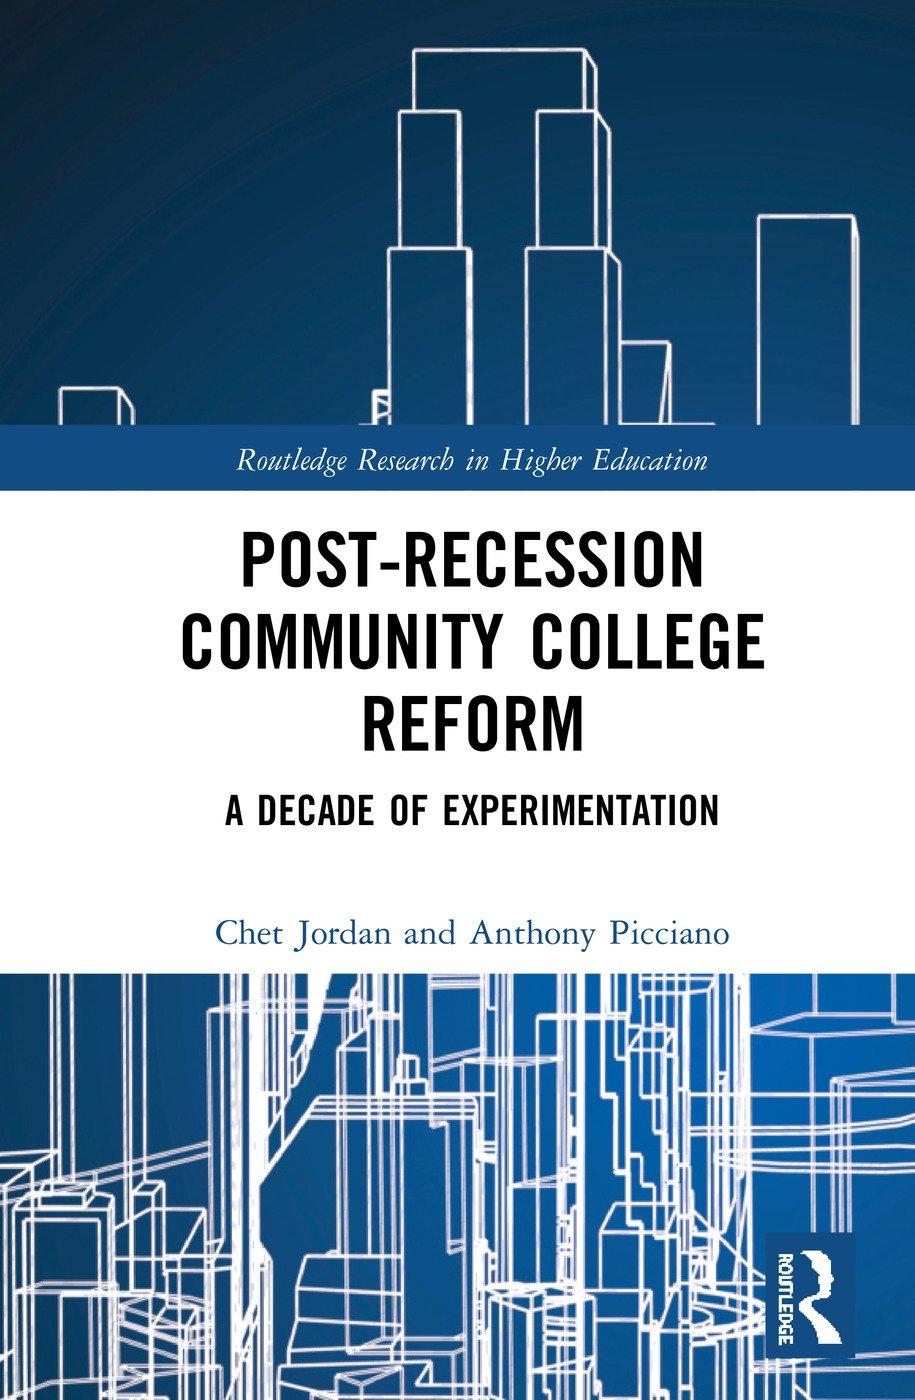 Post-Recession Community College Reform: A Decade of Experimentation book cover